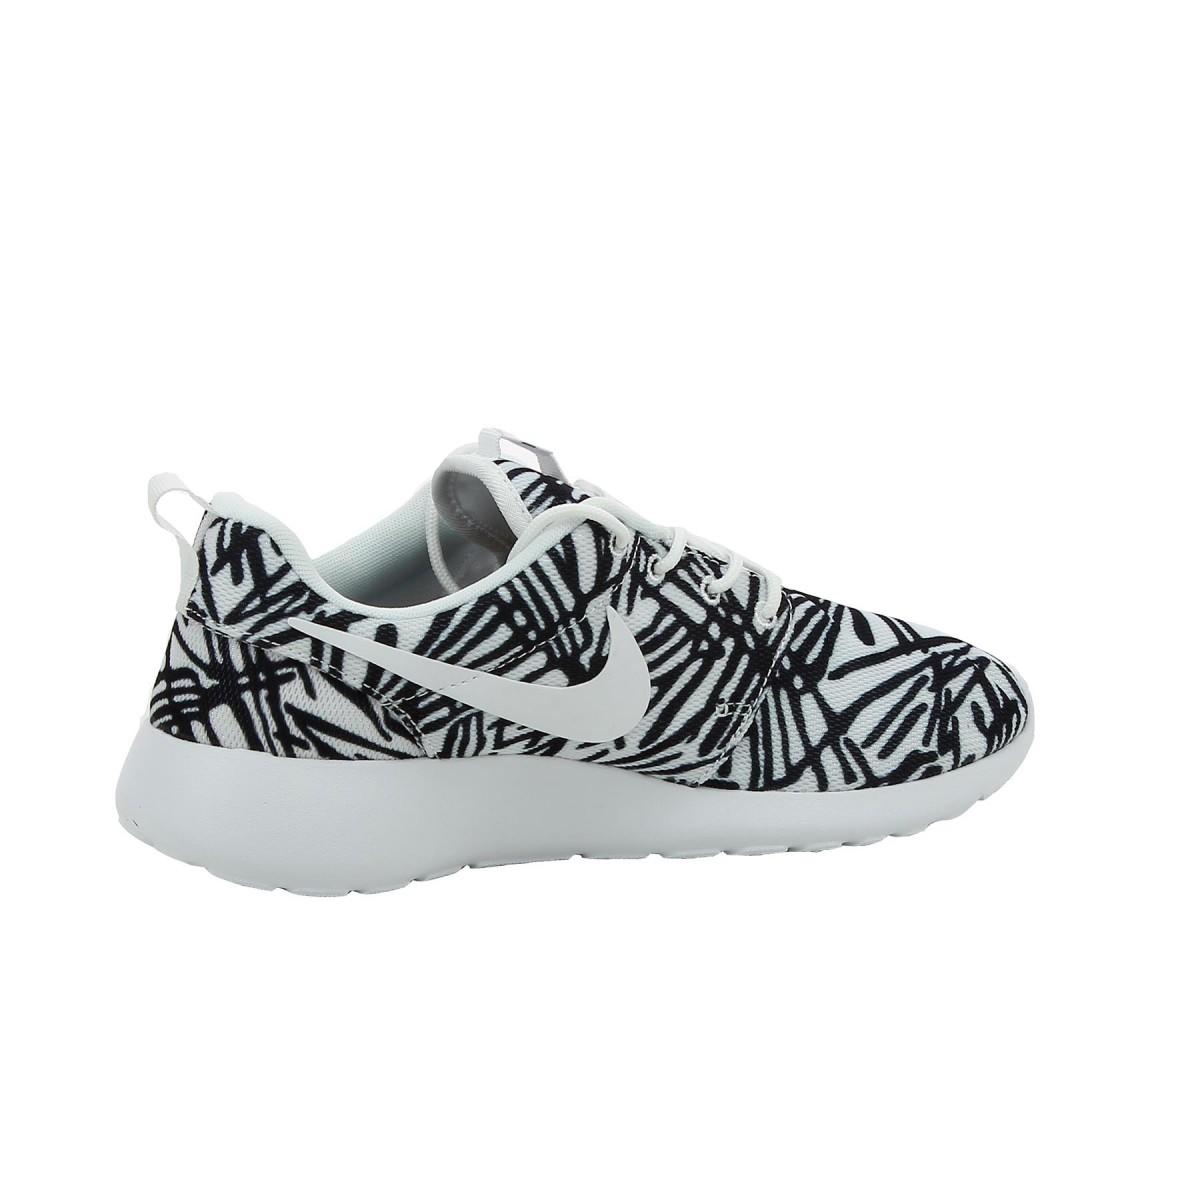 buy popular f4906 01dc1 Basket Nike Roshe Run Print Ref. 599432 110 Achat et vente